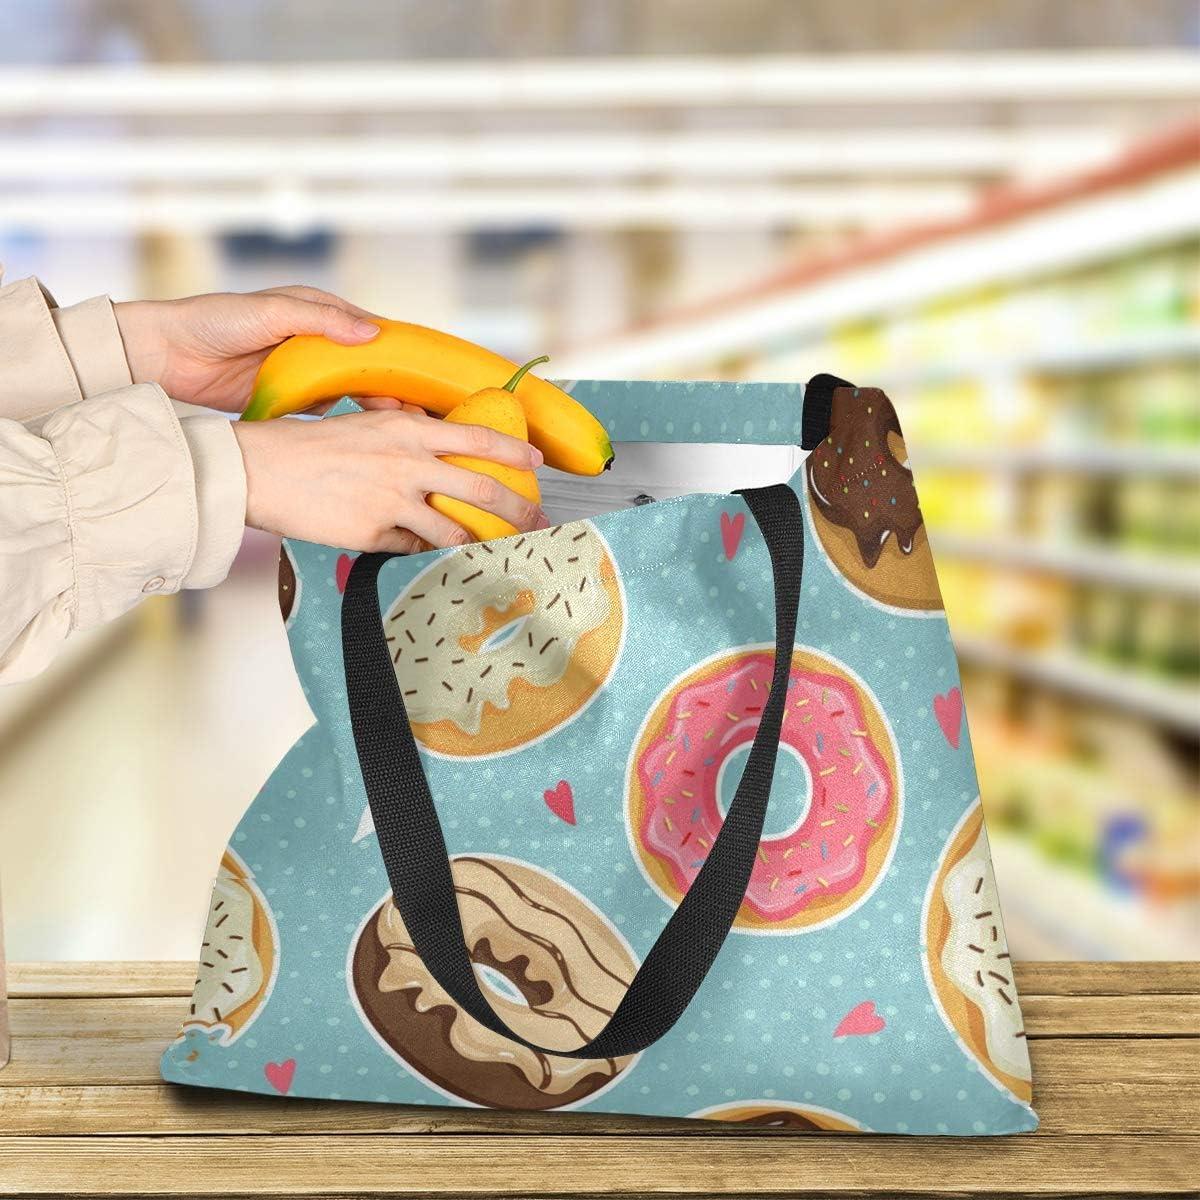 Canvas Tote Bag Colorful Orange Casual Handbags Lightweight Yoga Shopping organization Holder